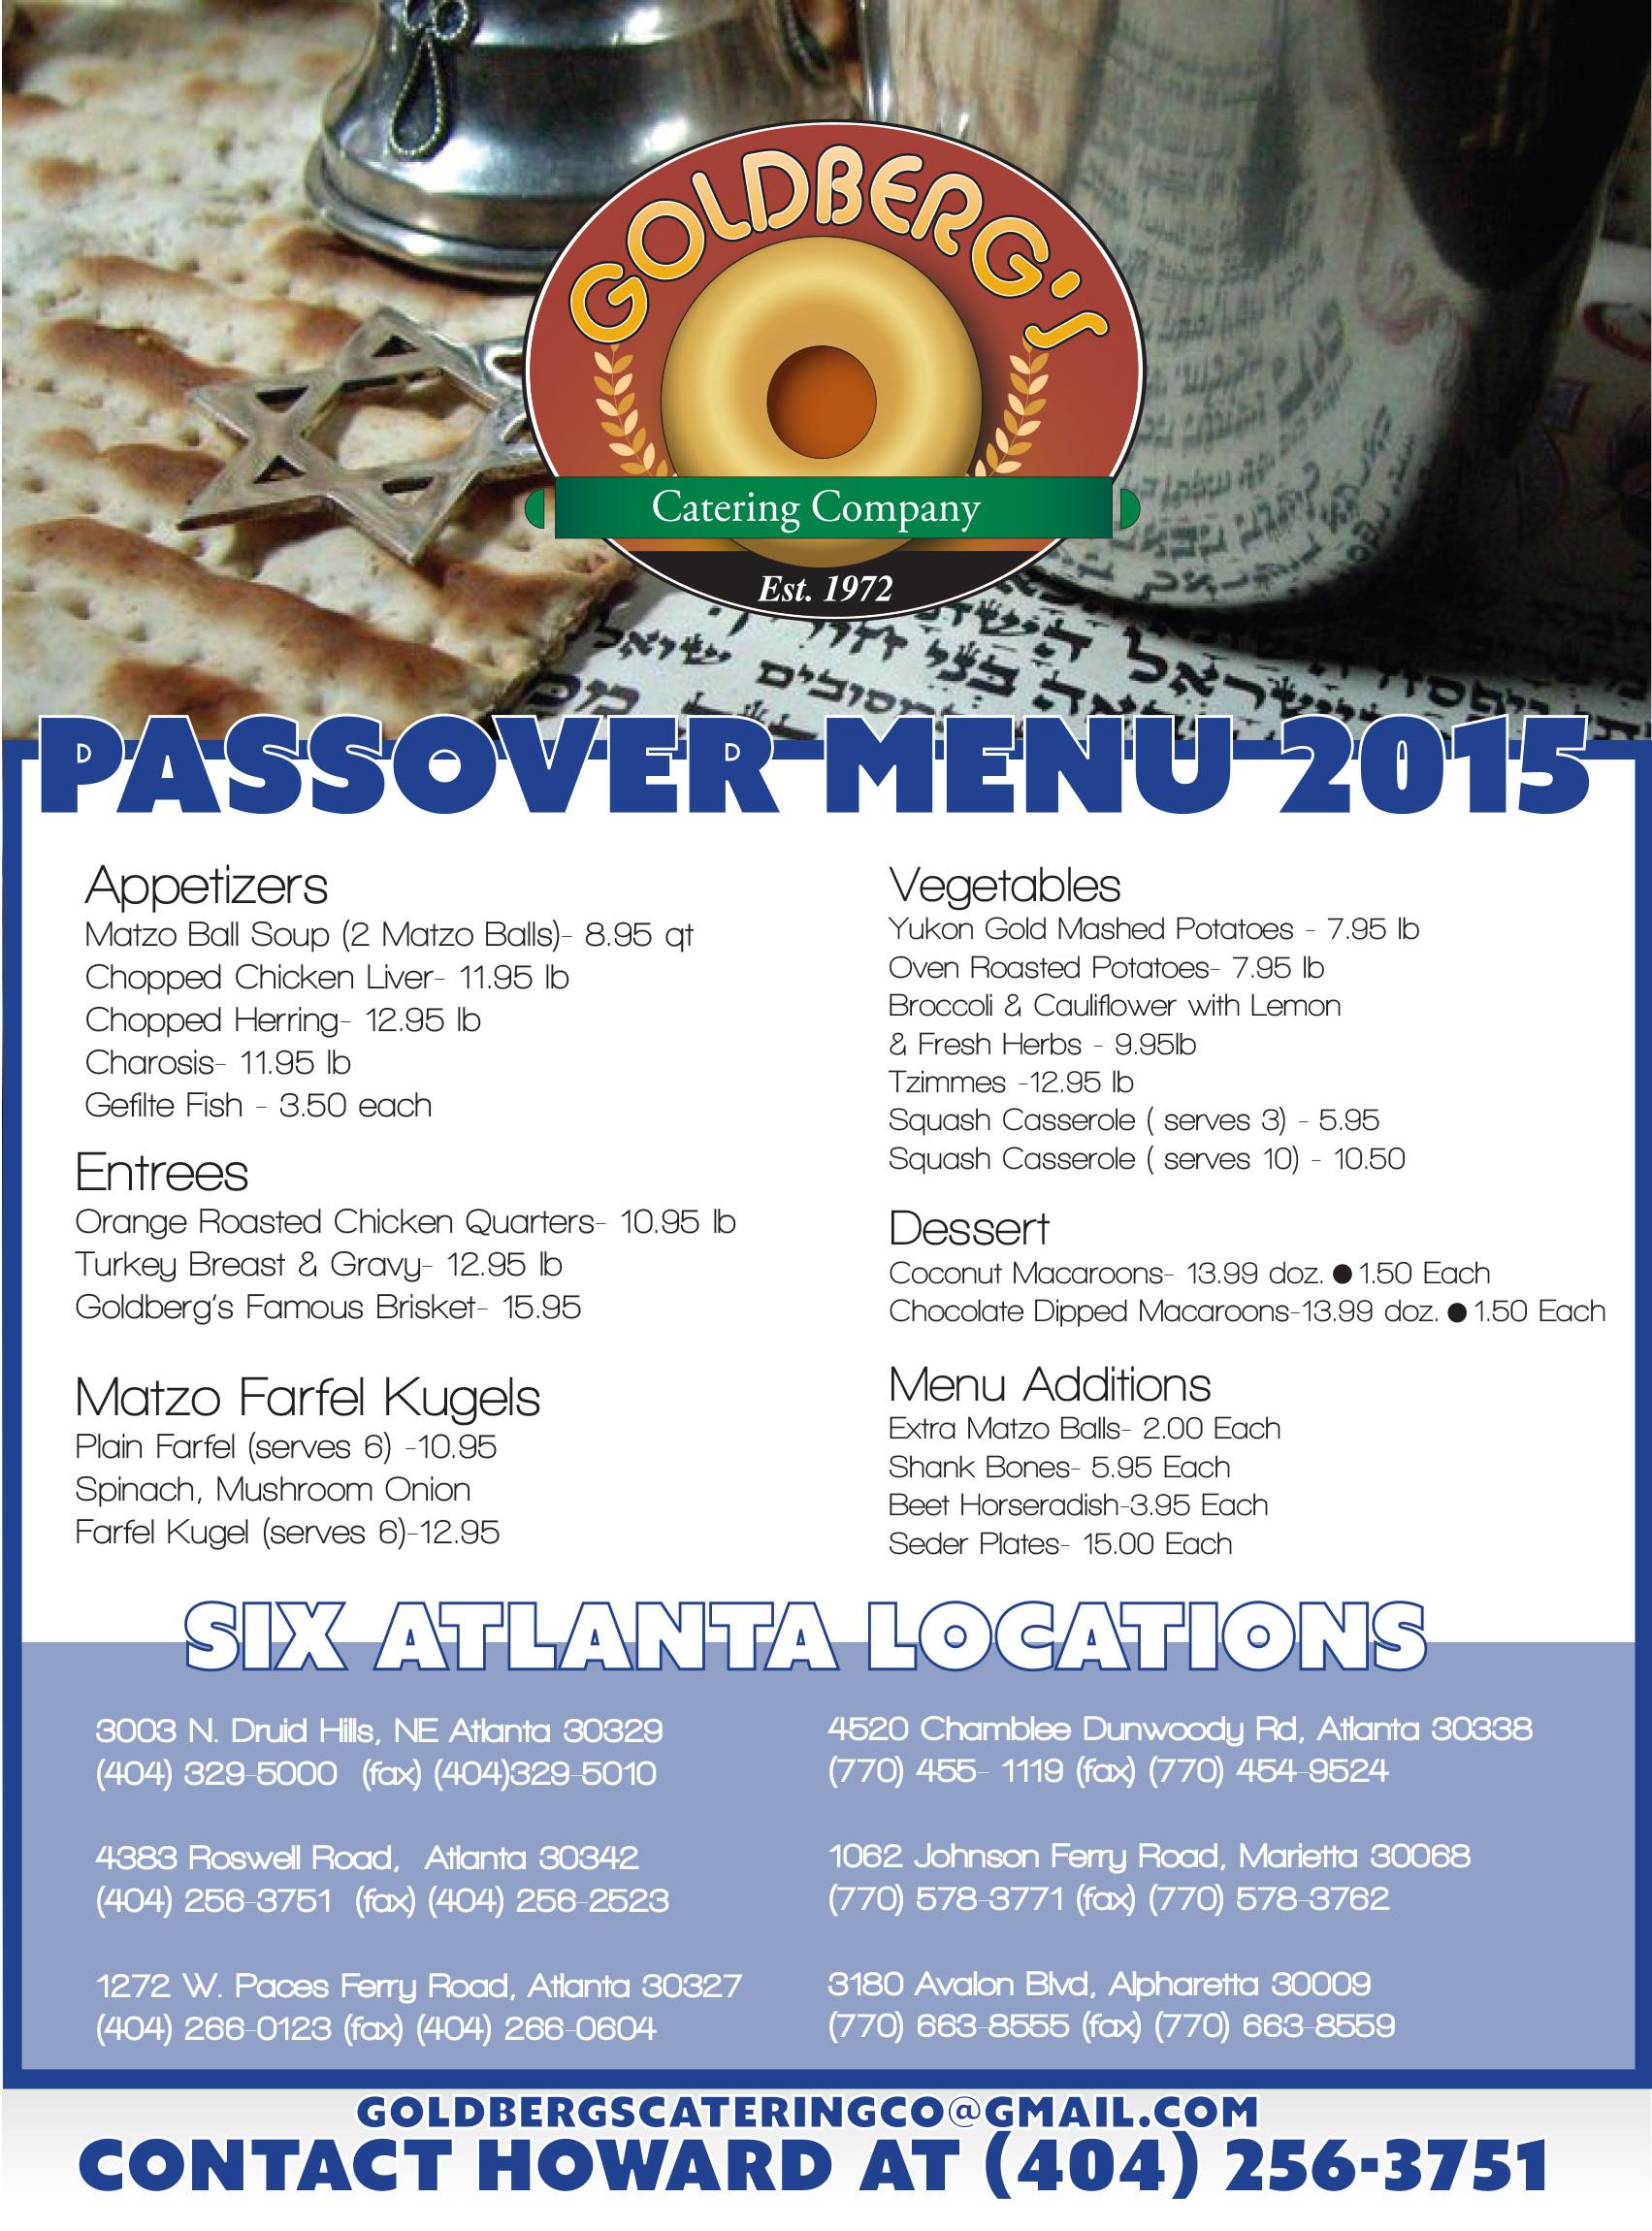 Passover Dinner Menus  Goldbergs Passover Menu